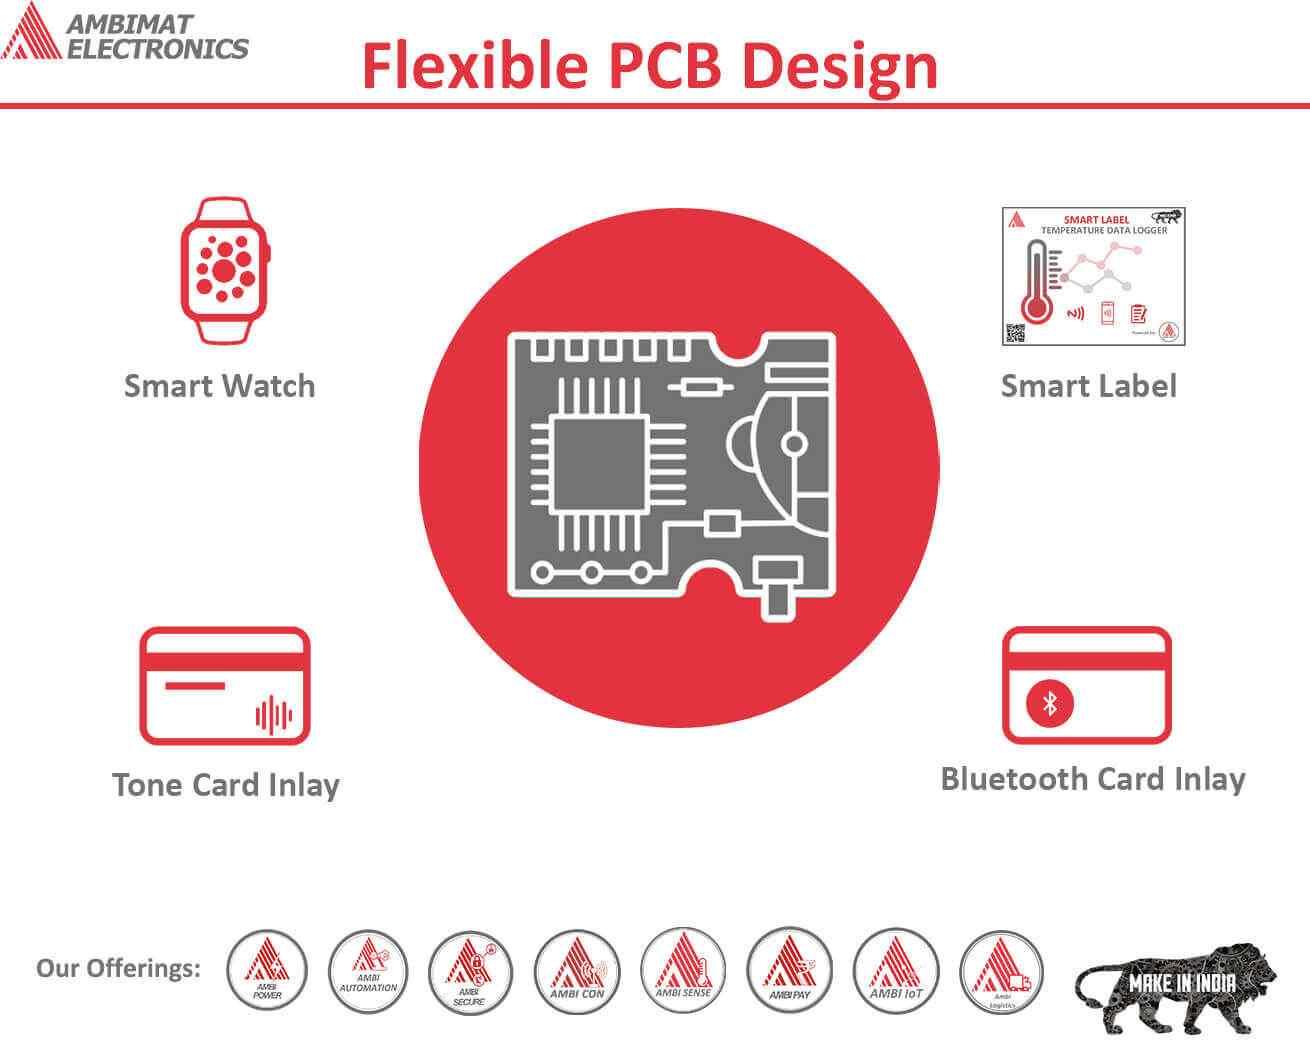 Flexible PCB designs